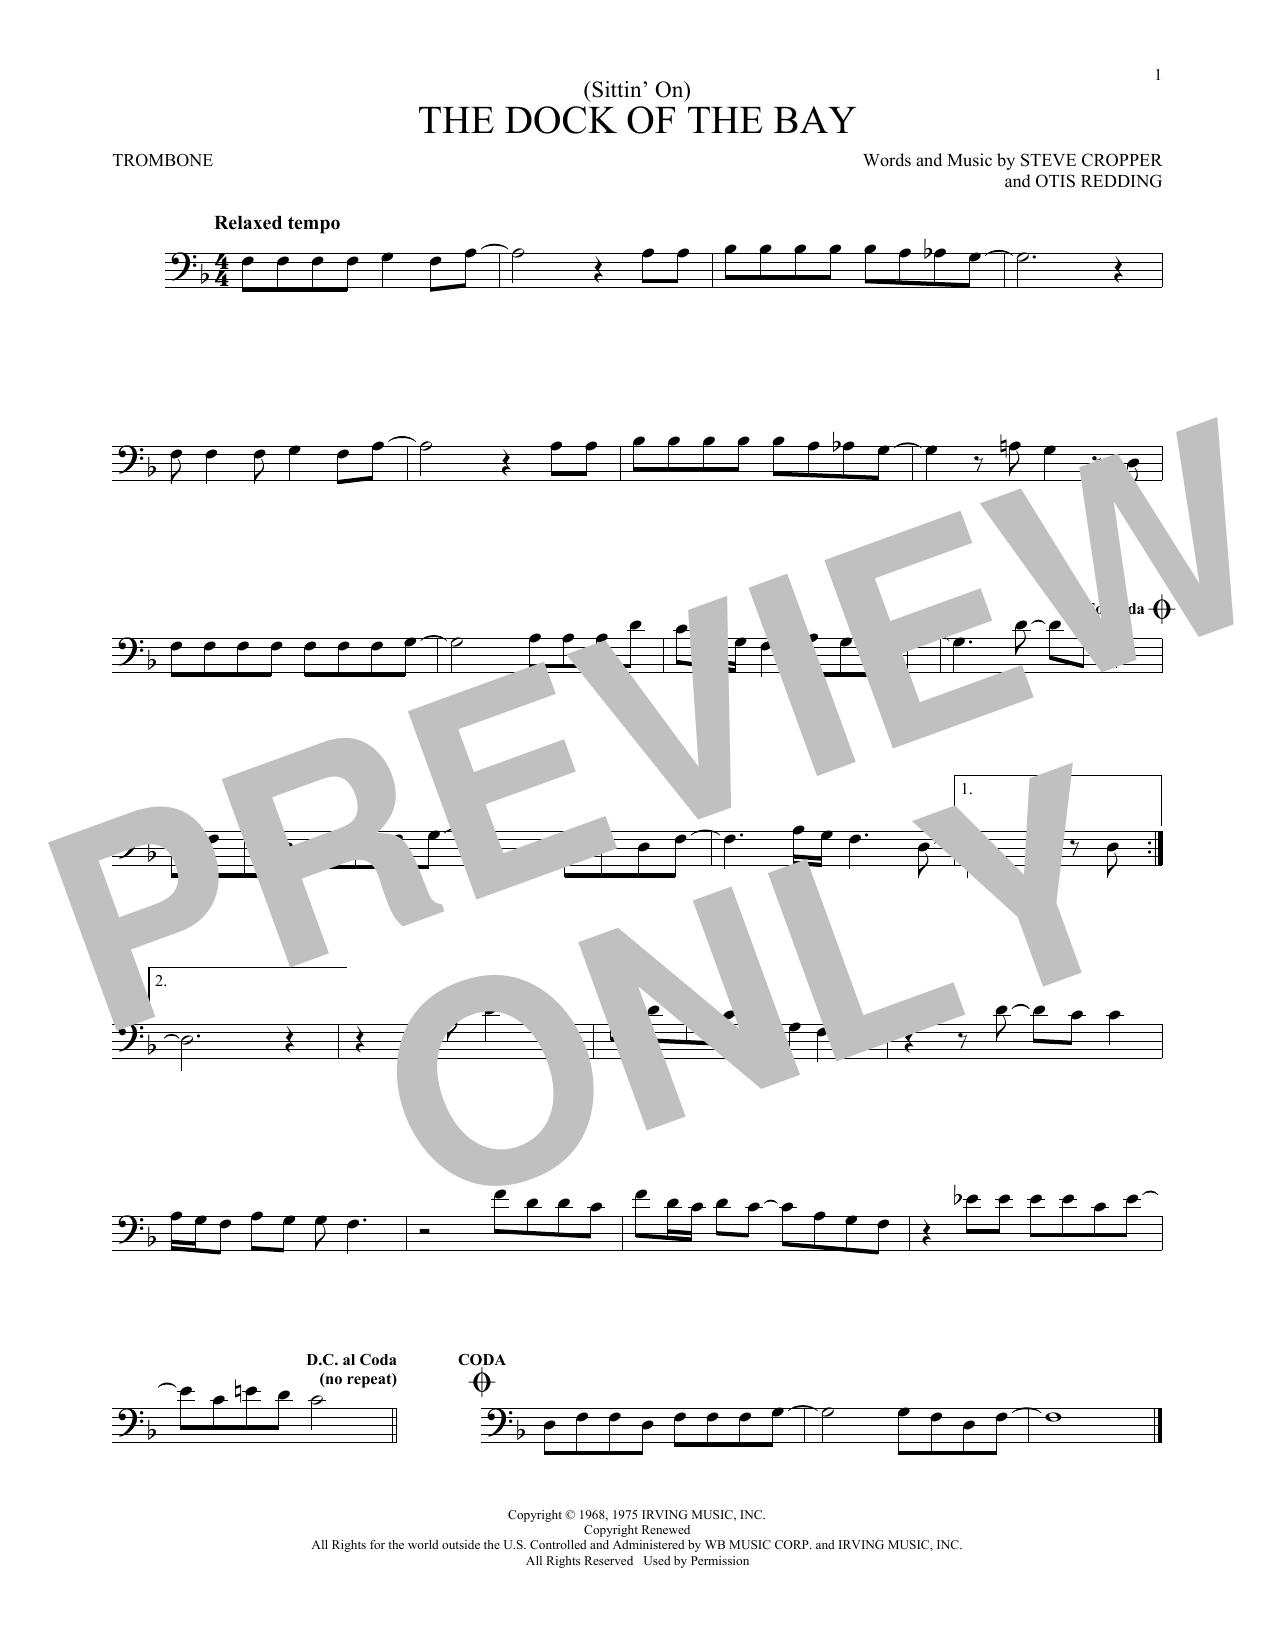 Partition autre (Sittin' On) The Dock Of The Bay de Otis Redding - Trombone